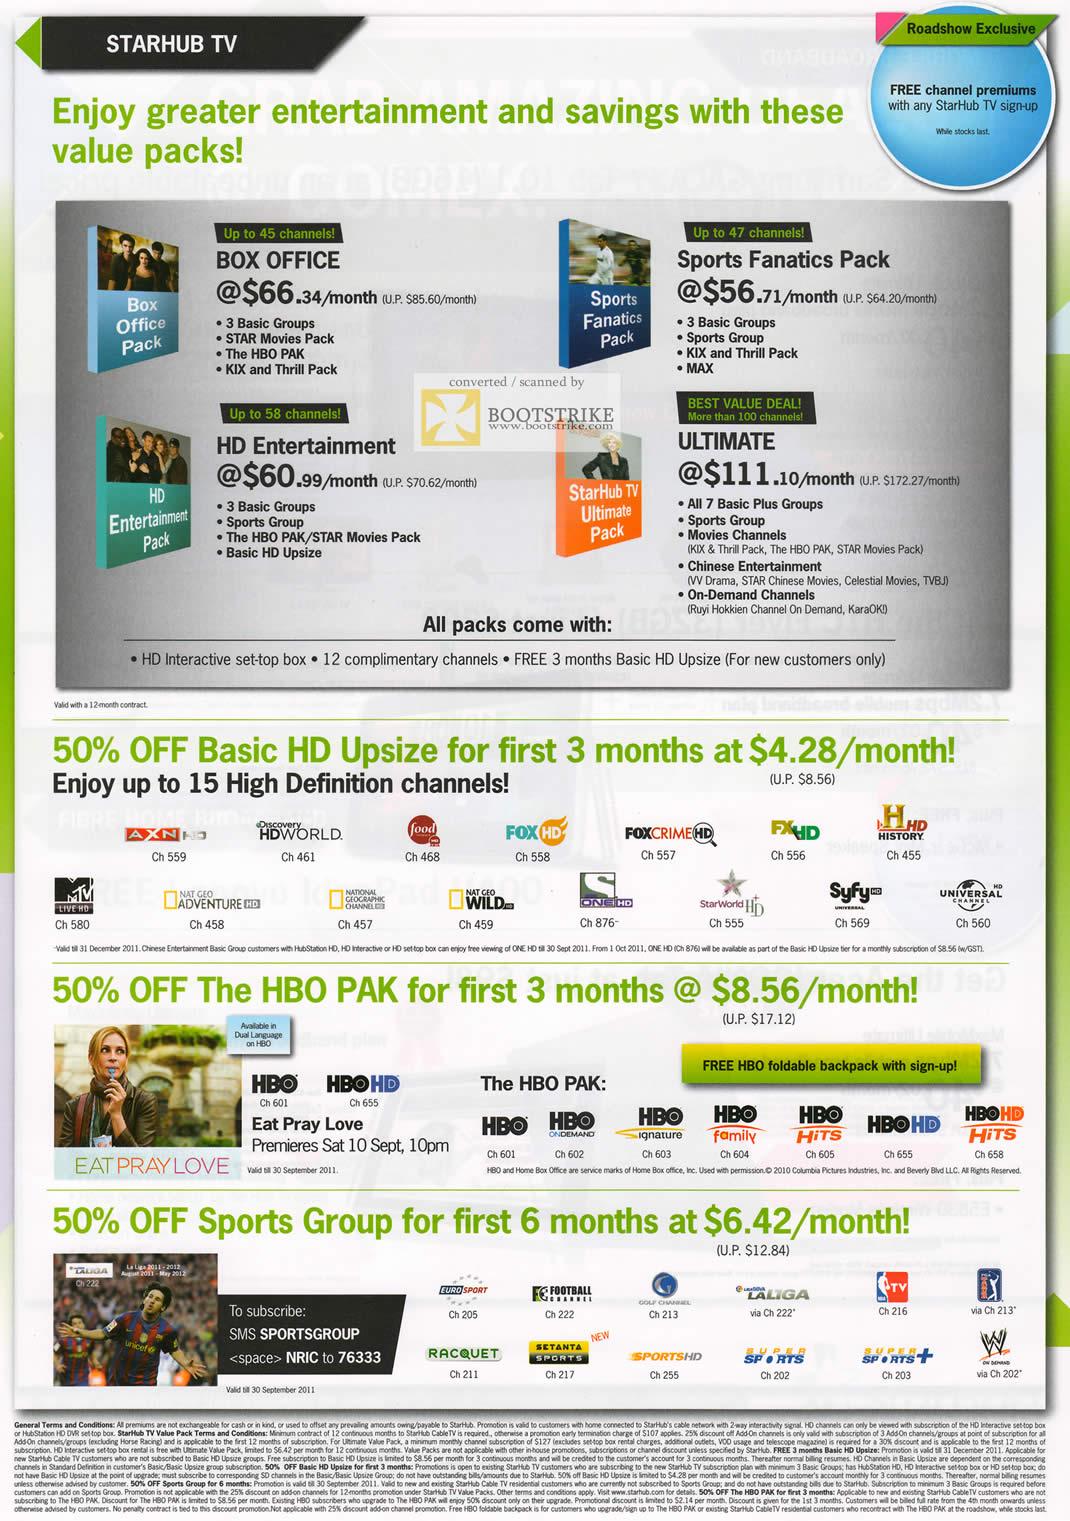 COMEX 2011 price list image brochure of Starhub TV Box Office Sports Fanatics Pack HD Entertainment Ultimate Upsize HBO Pak Sports Group